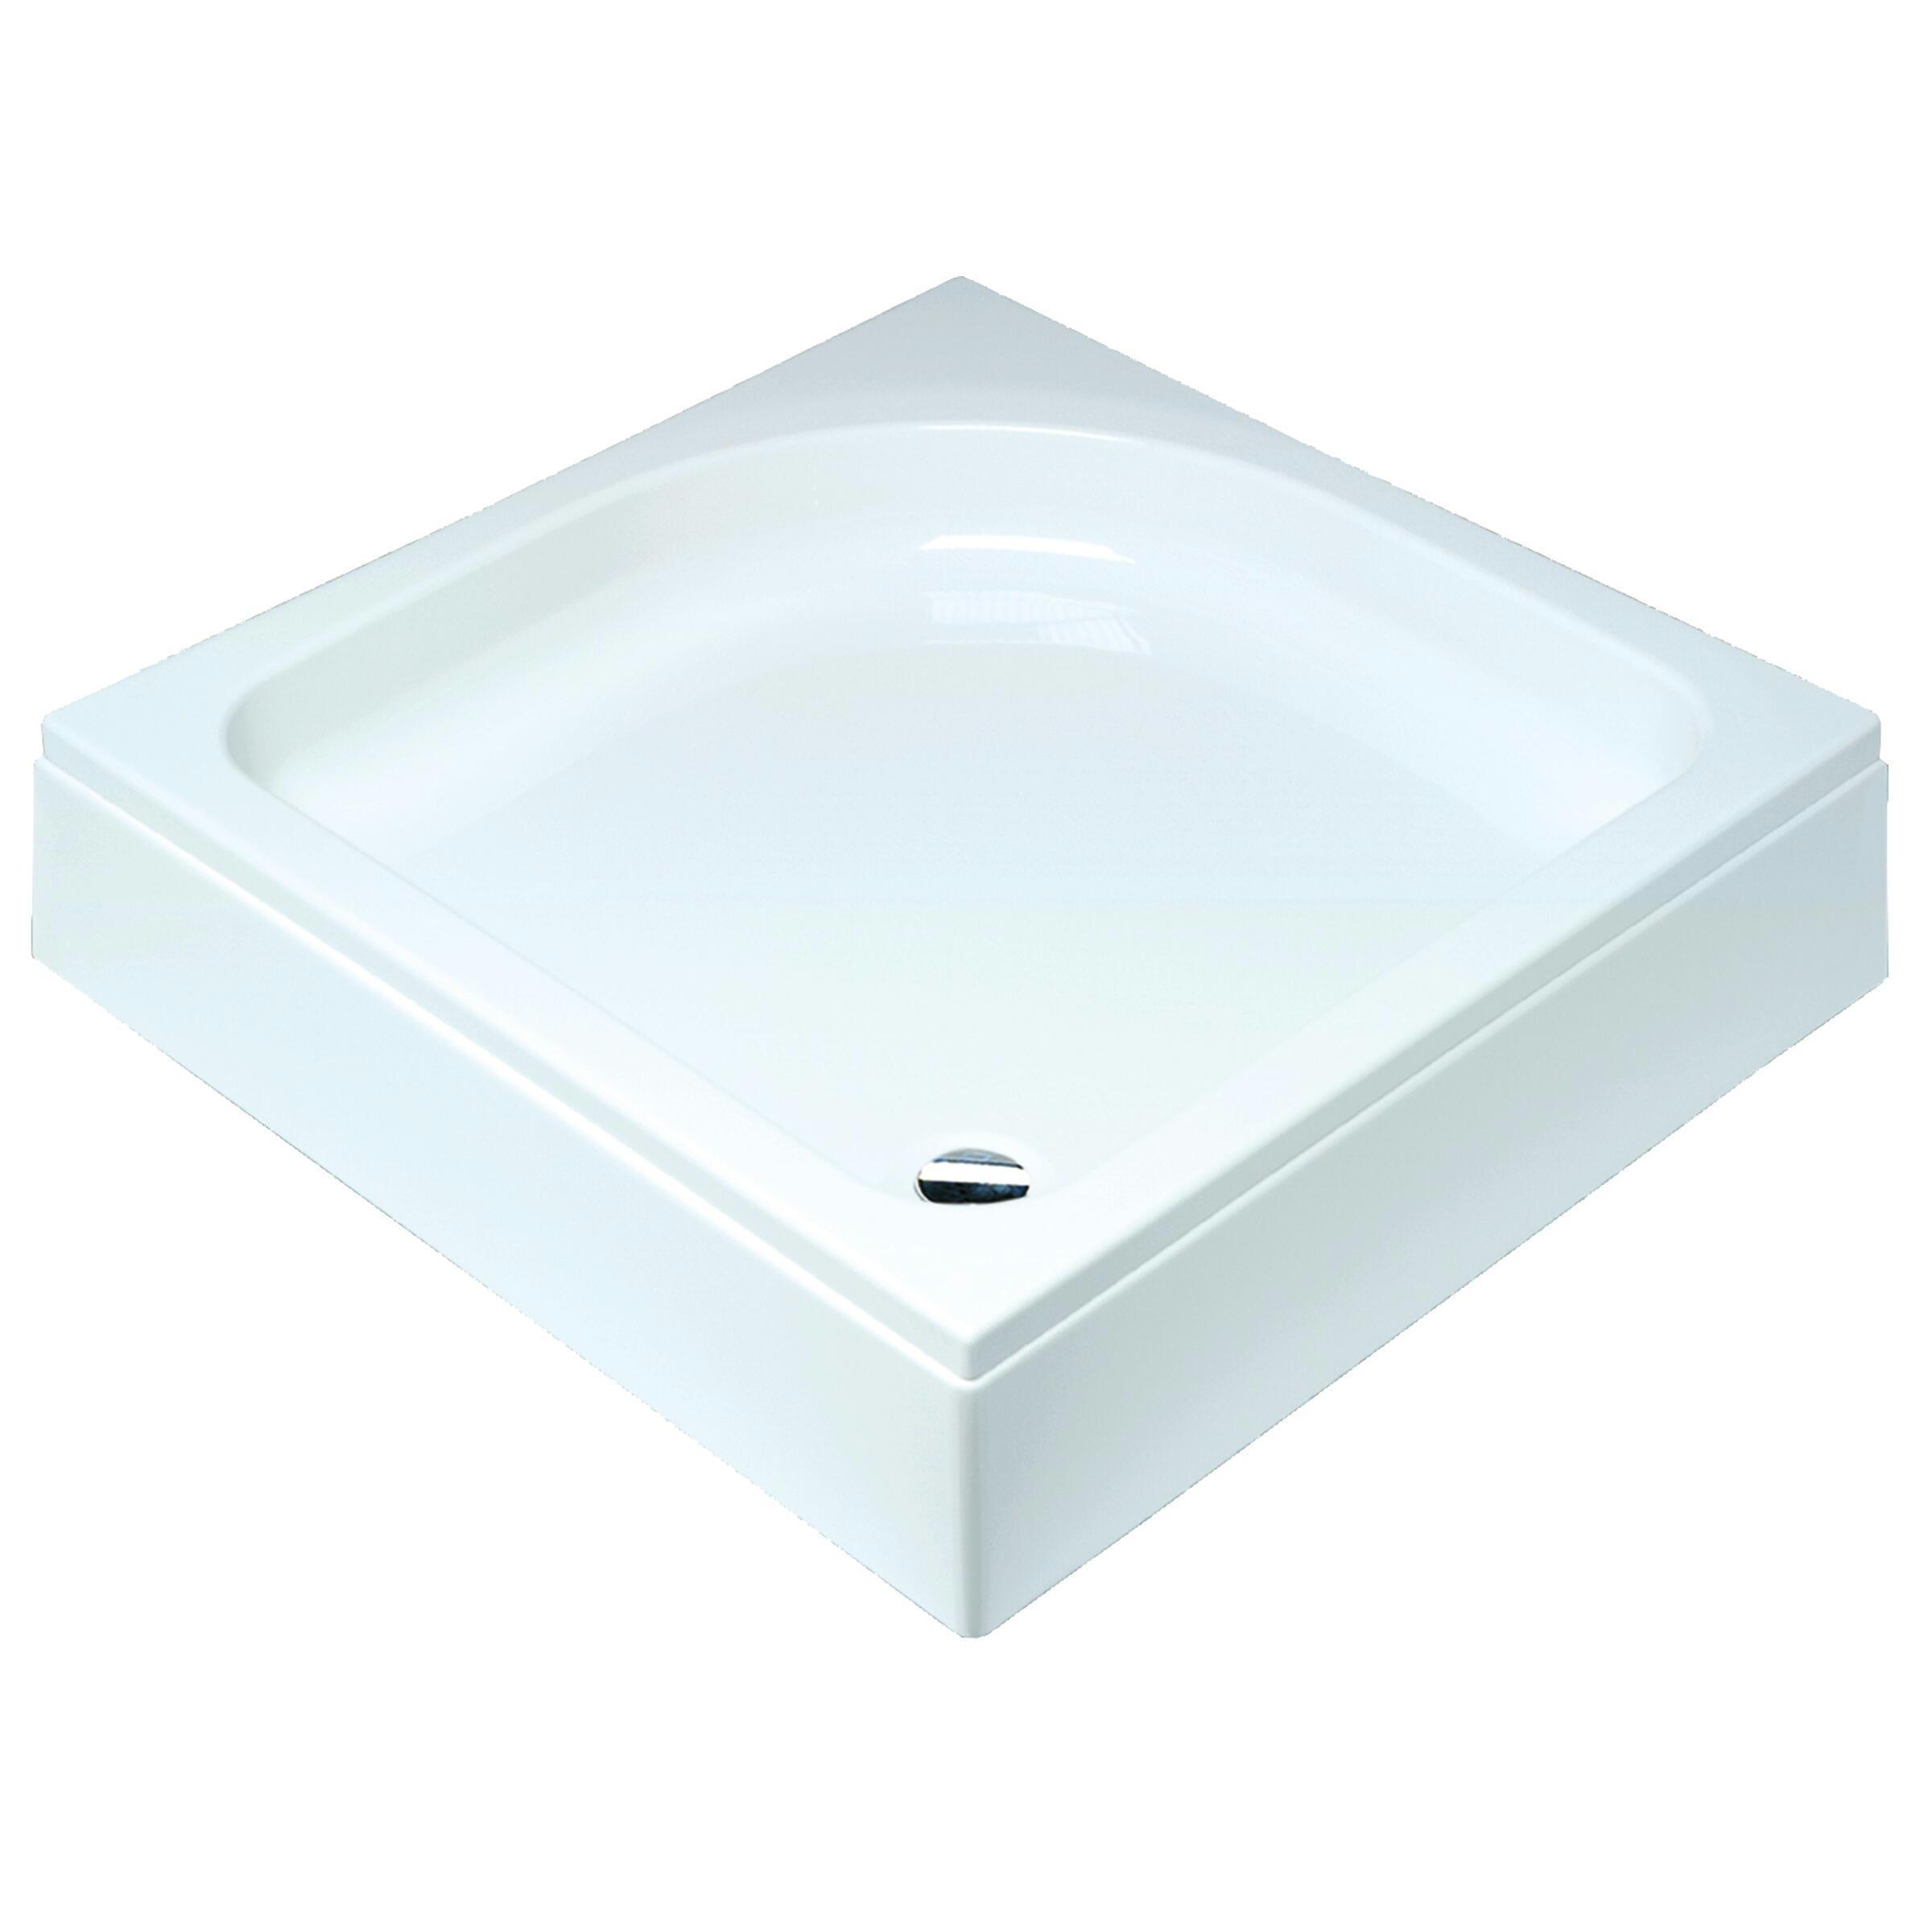 Sealskin Comfort douchebak vierkant 90x90 cm opbouw wit